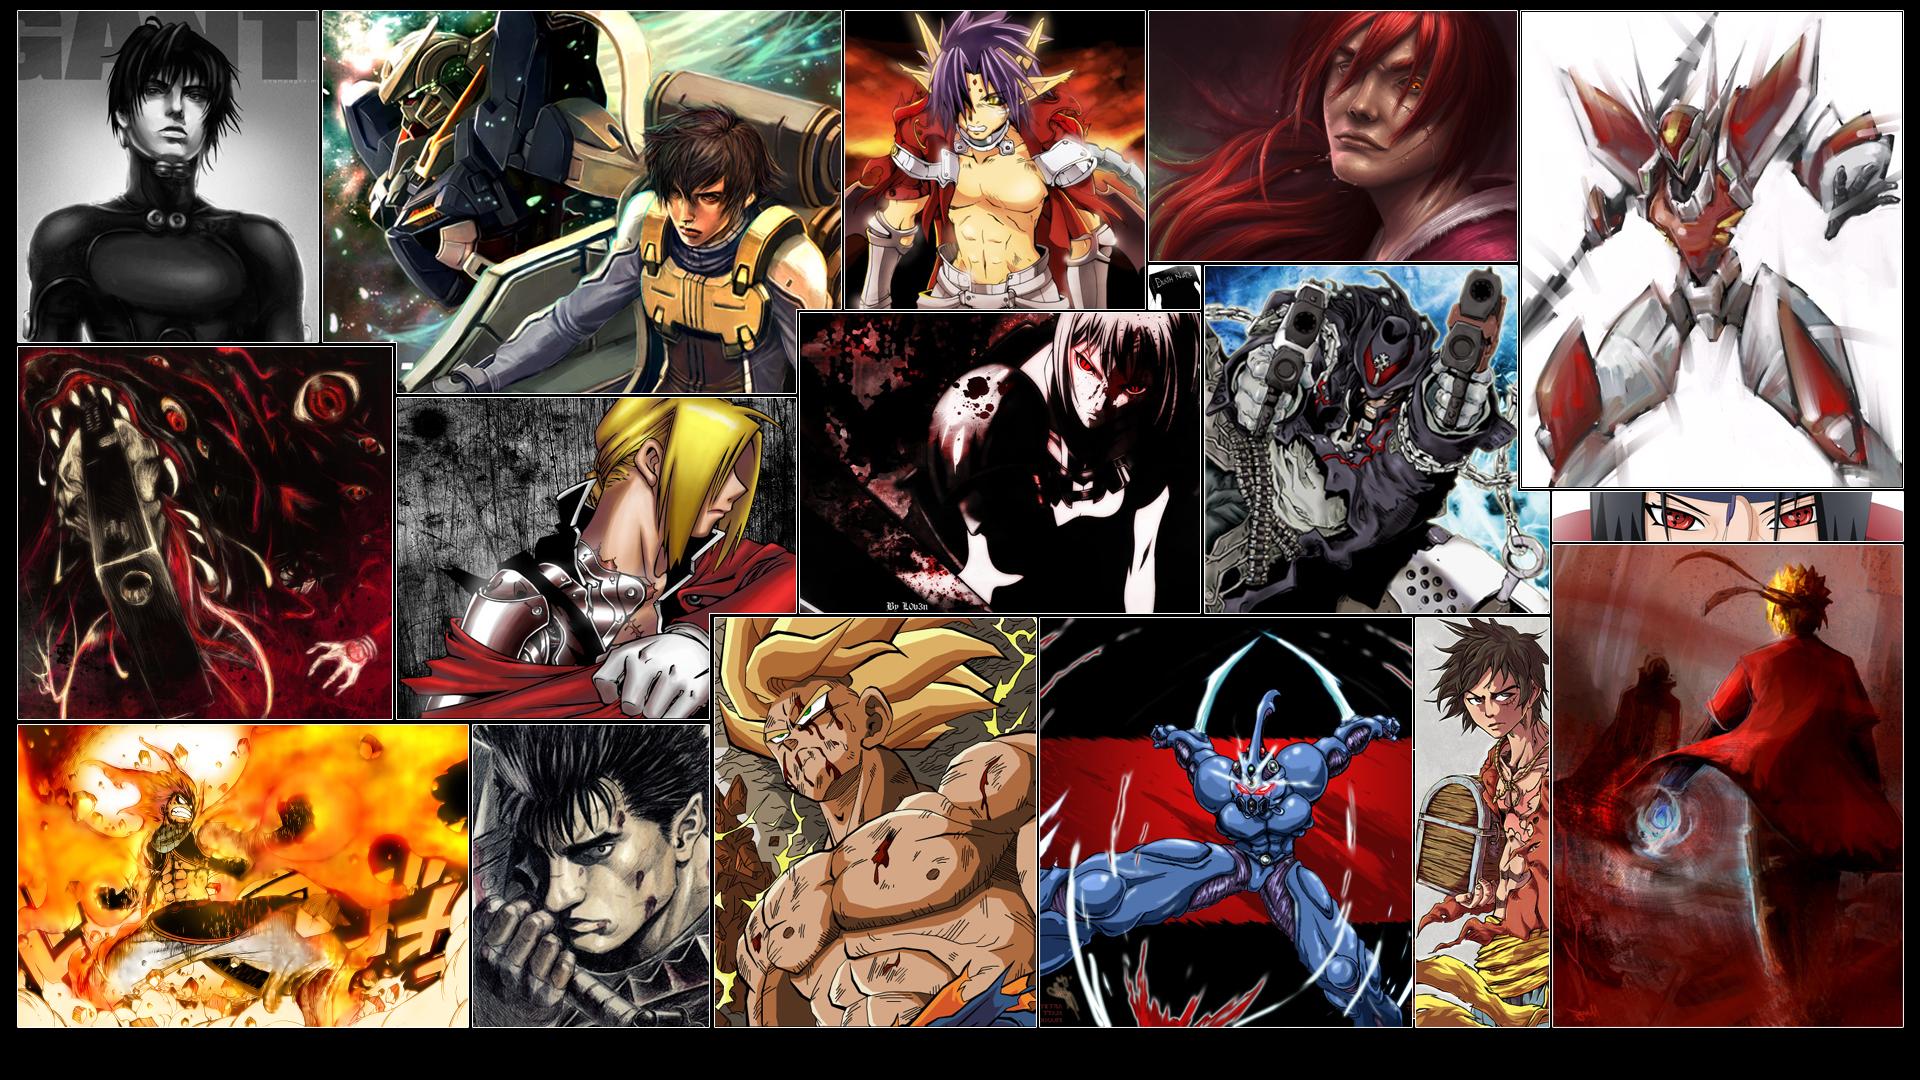 anime_heroes_wallpaper_by_gt_orphan-d5leqxs.jpg